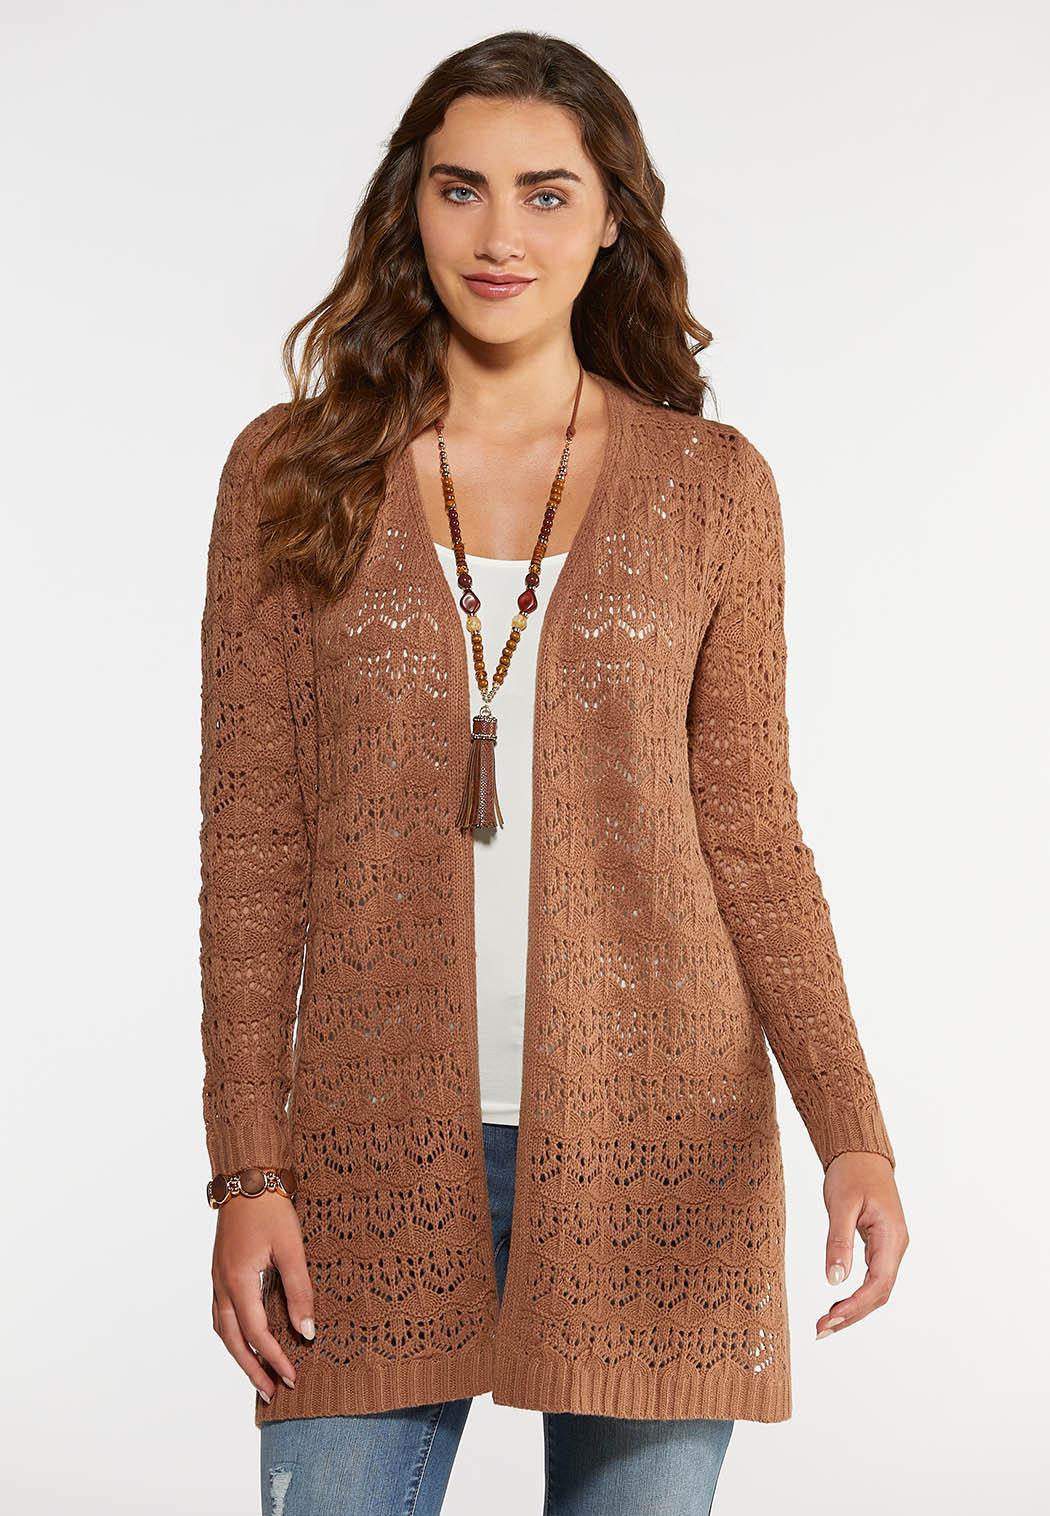 Beige Duster Cardigan Sweater